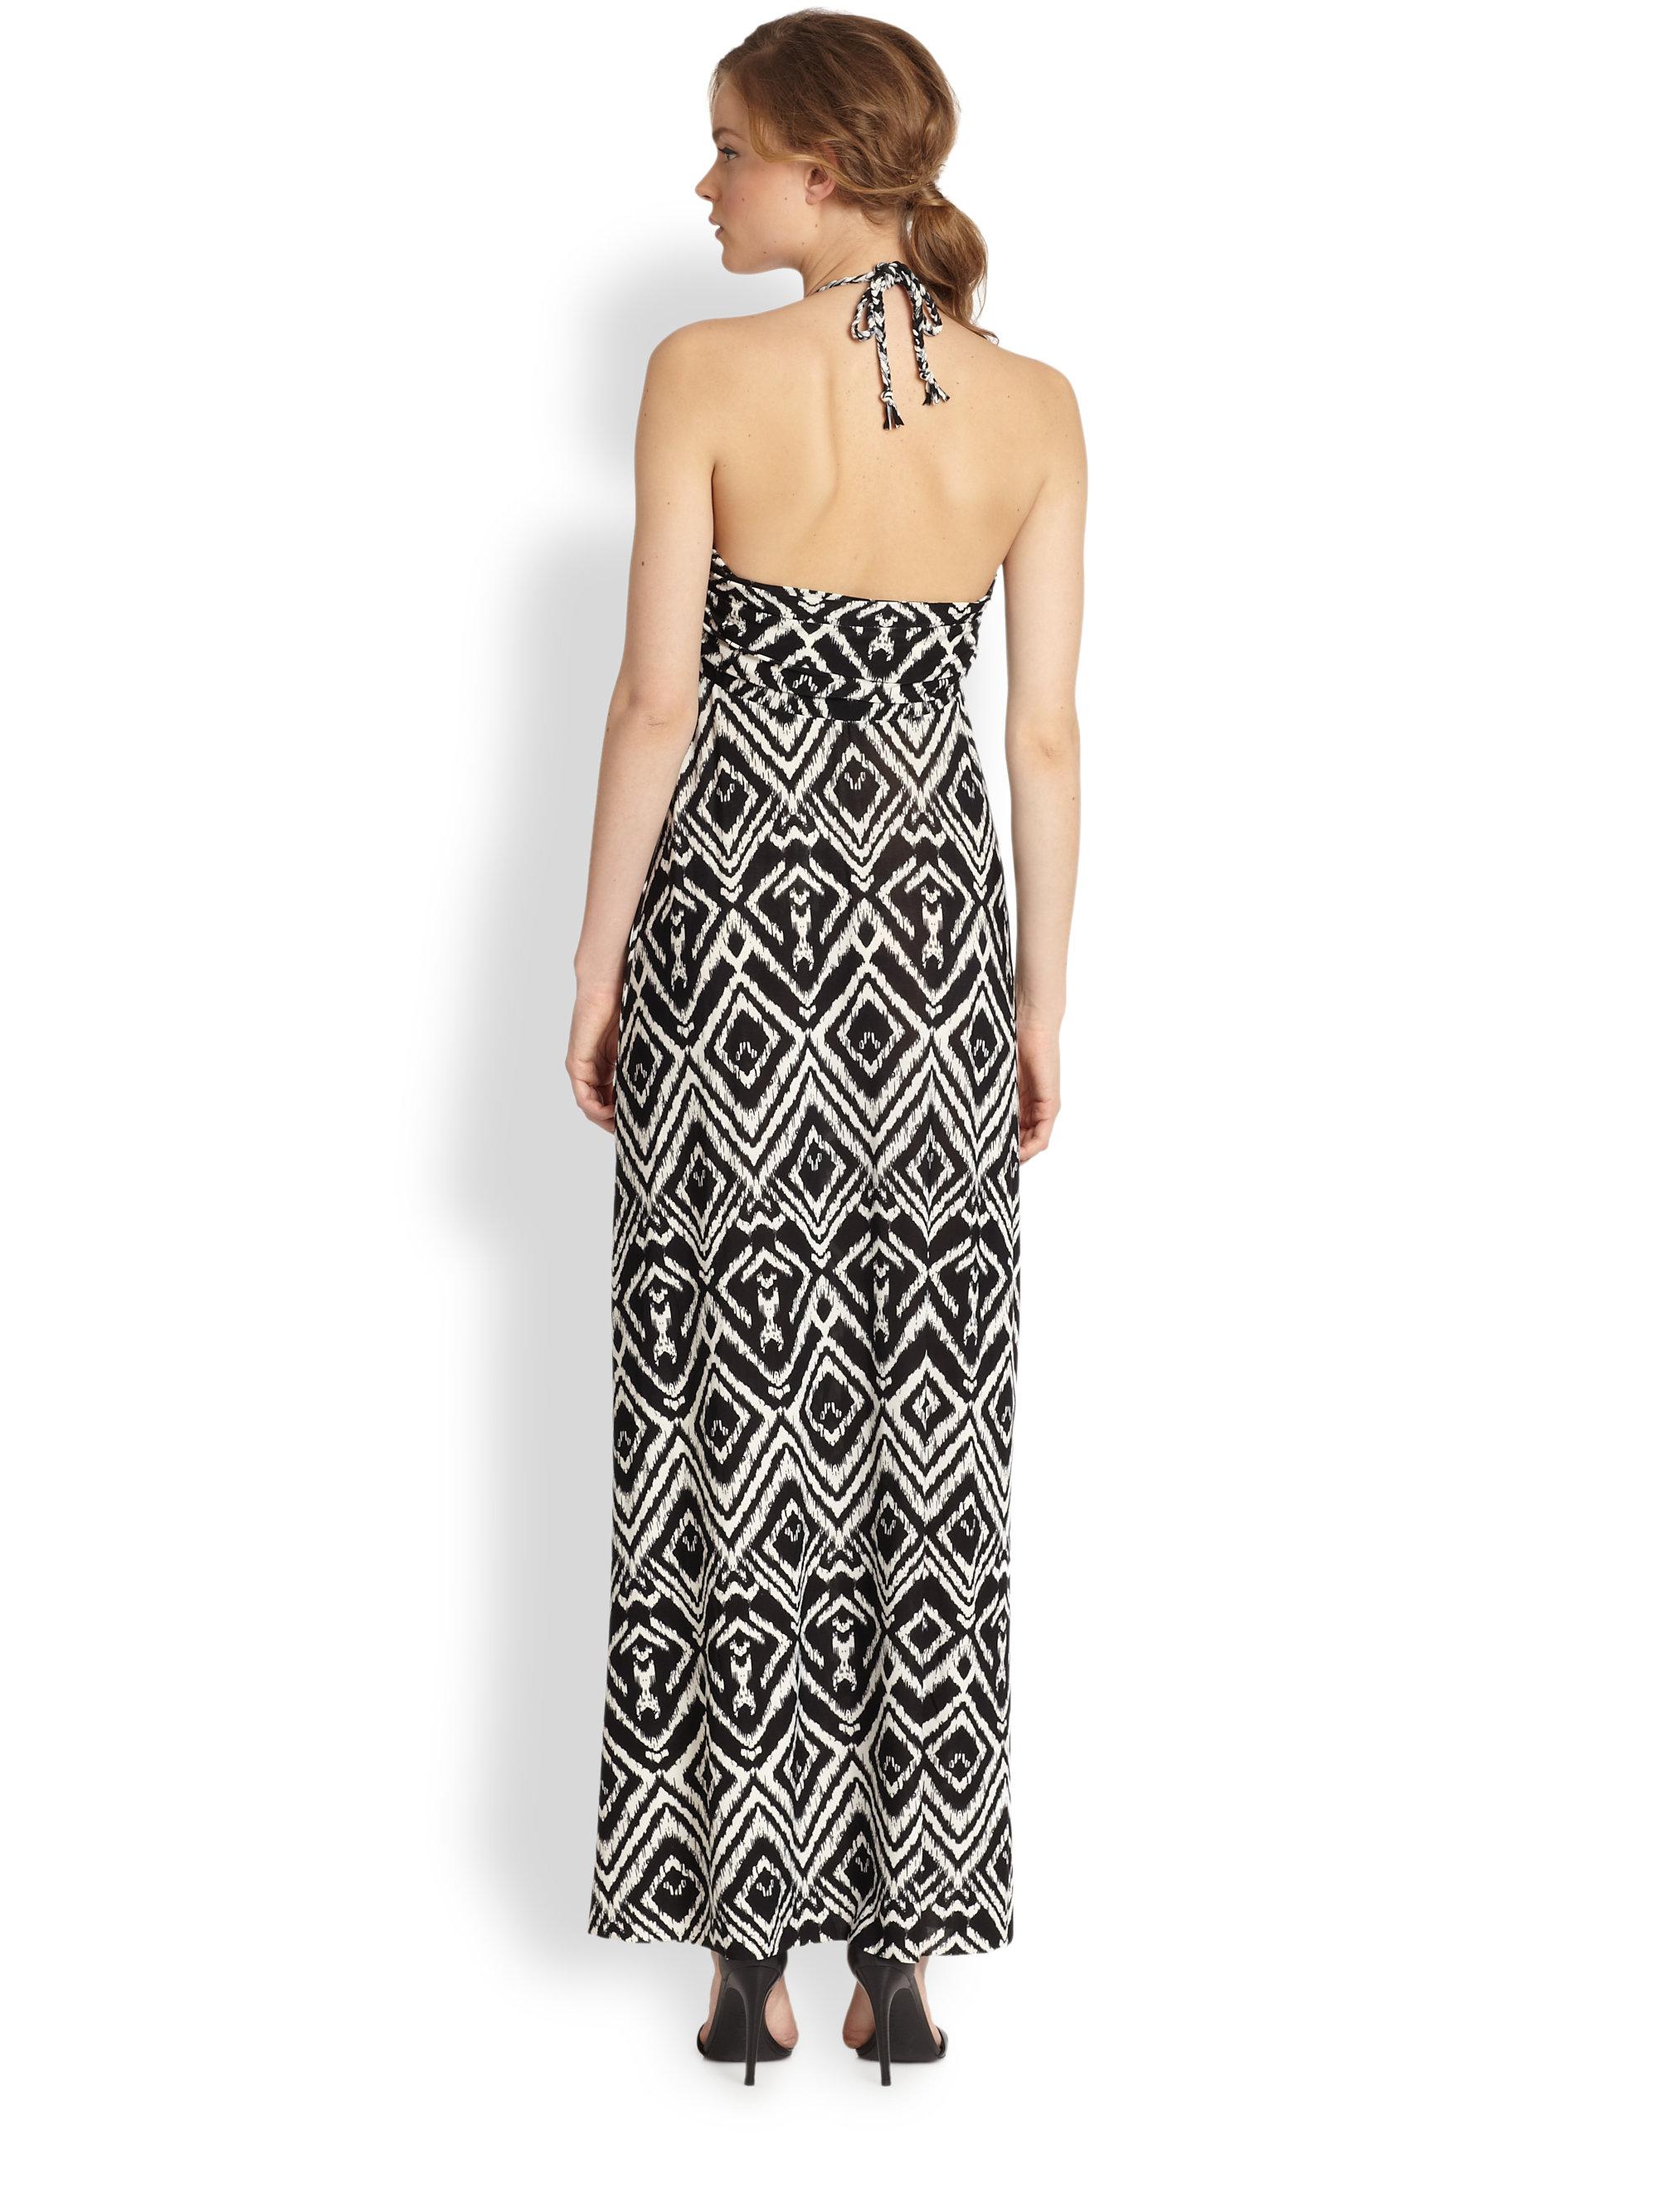 T bags halter maxi dress in black